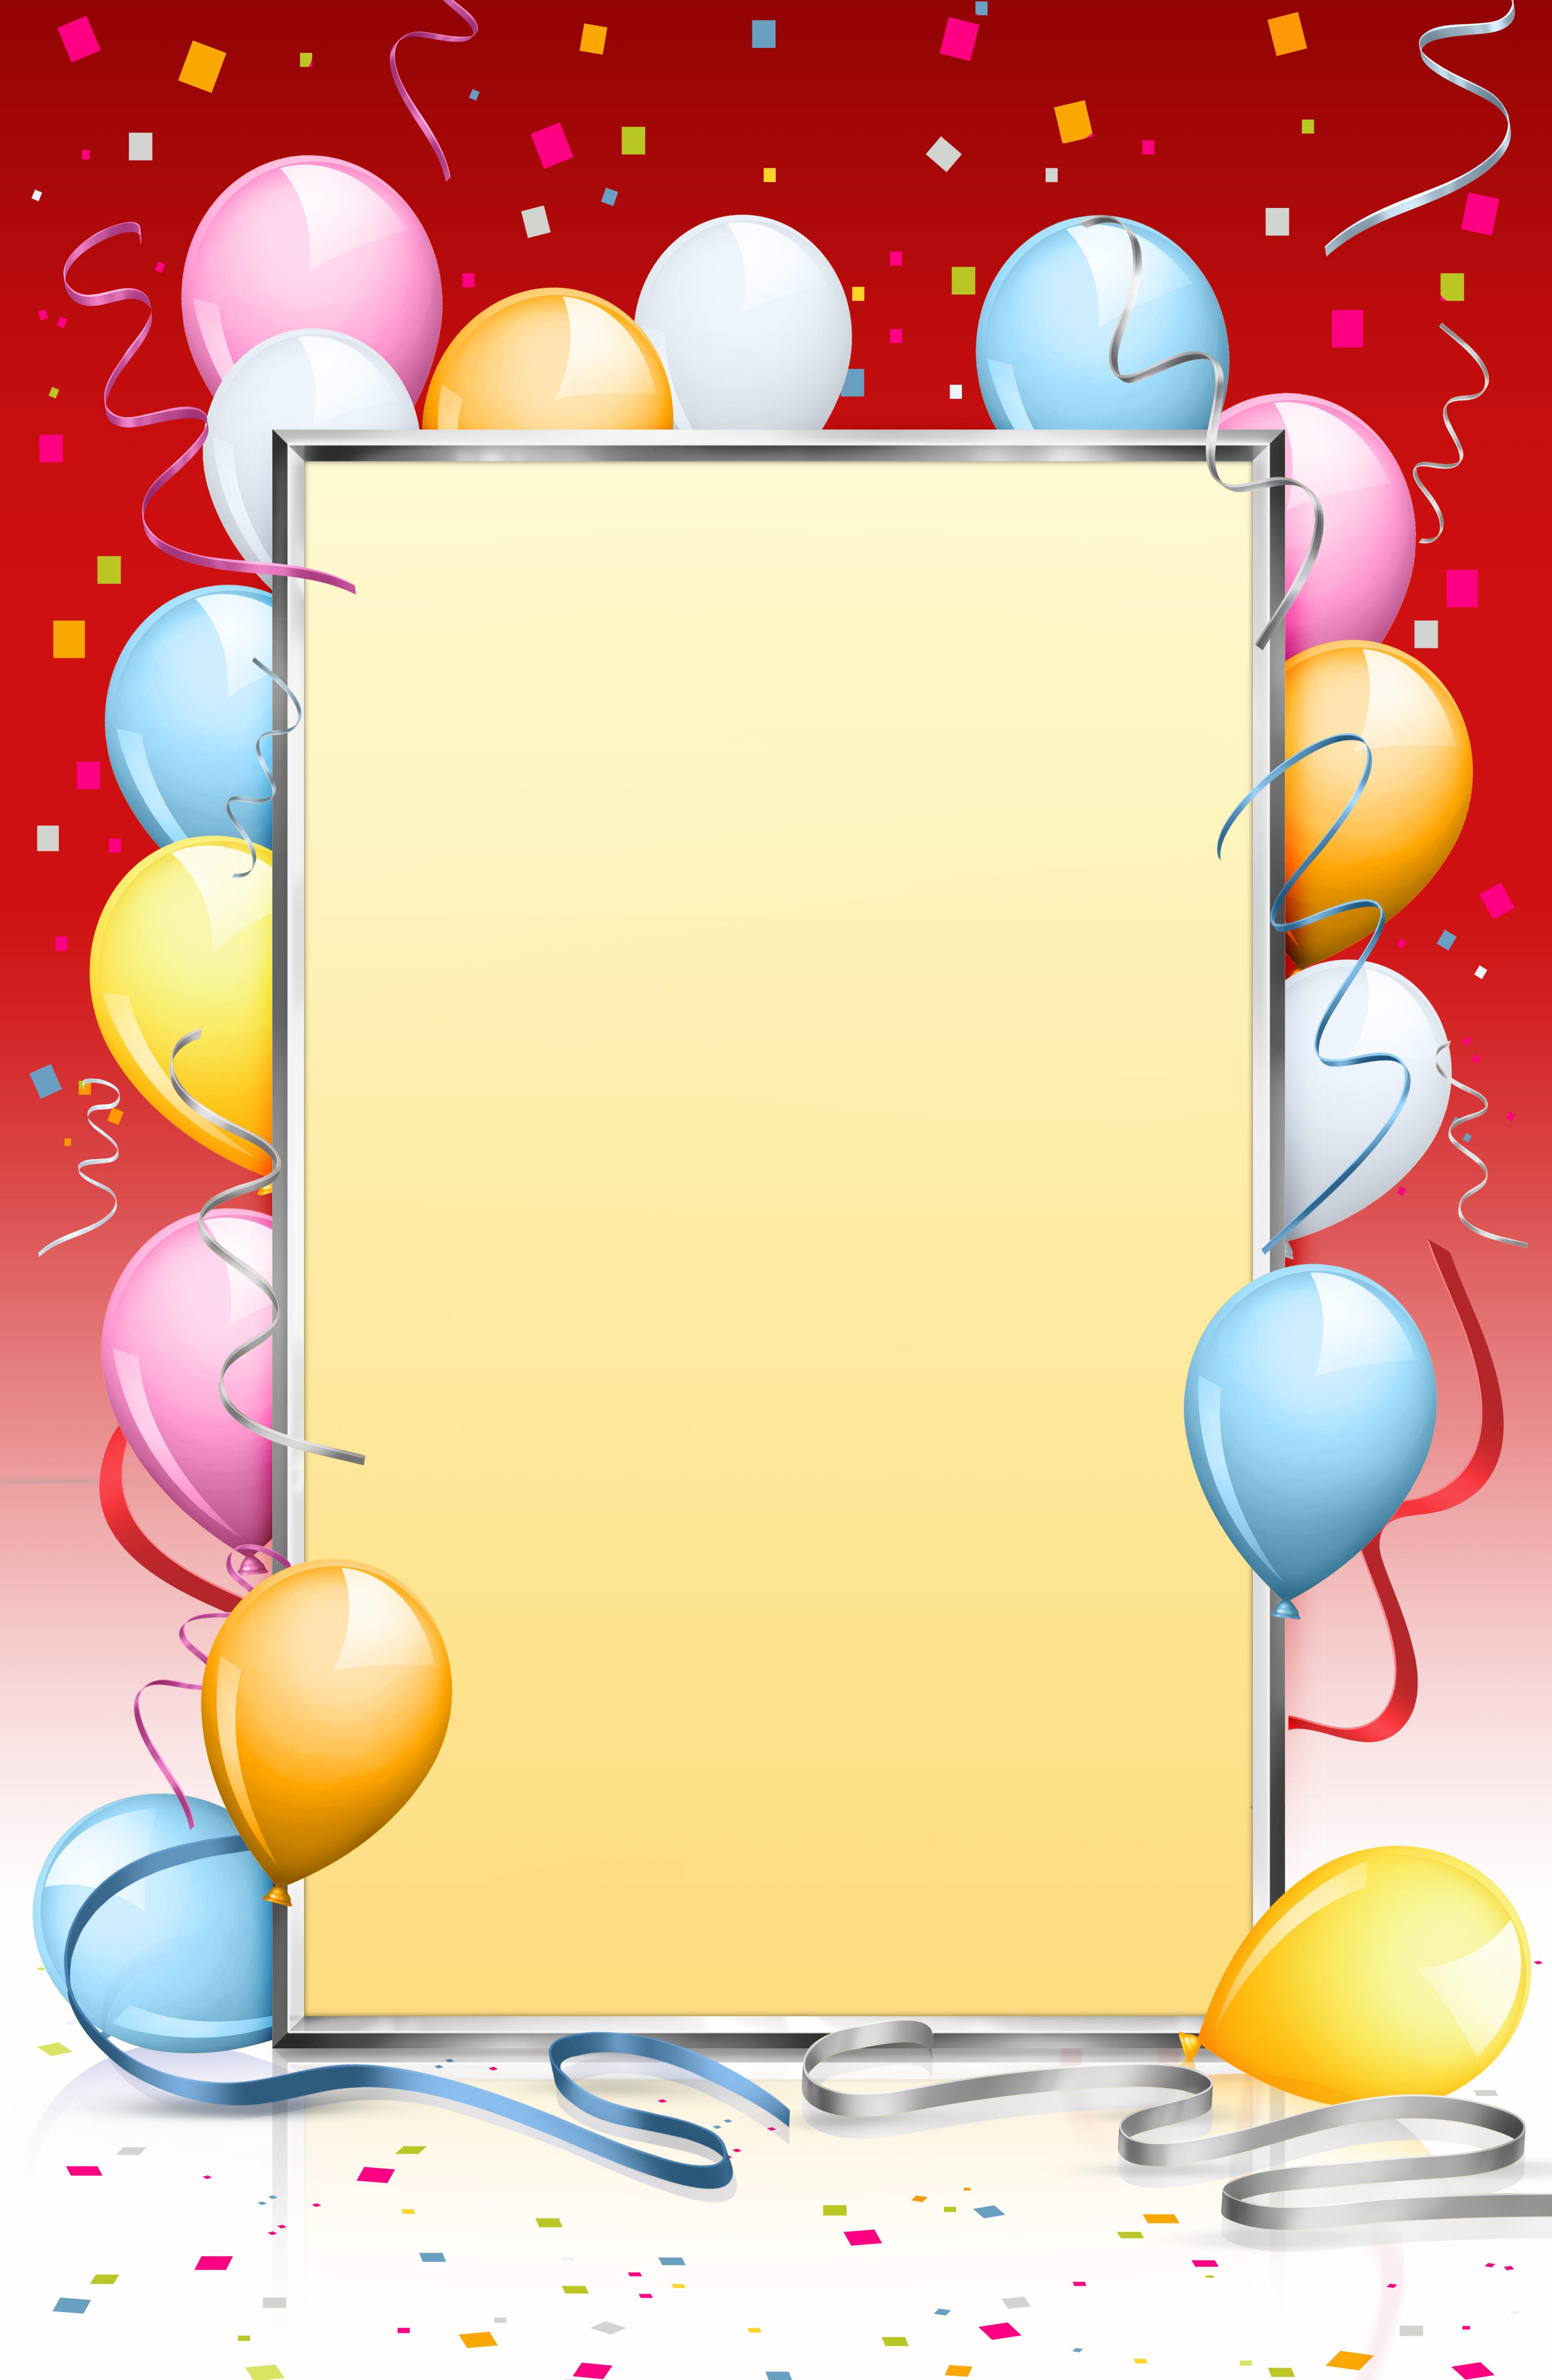 Шаблон поздравление с днем рождения на стенд в организации